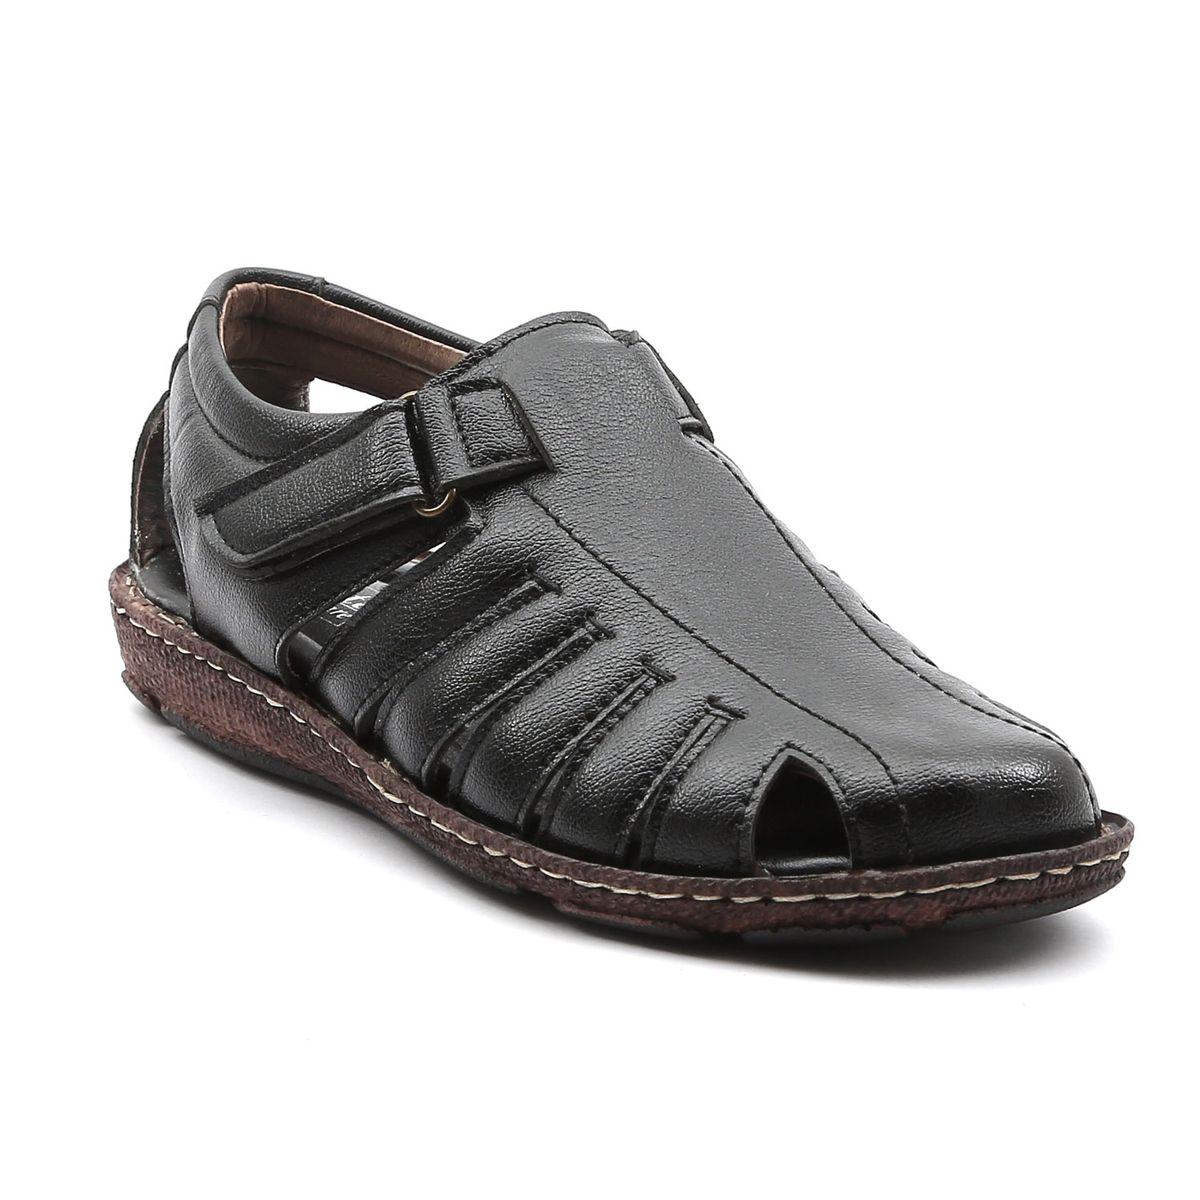 Ajanta Men s Classy Sandals - Black